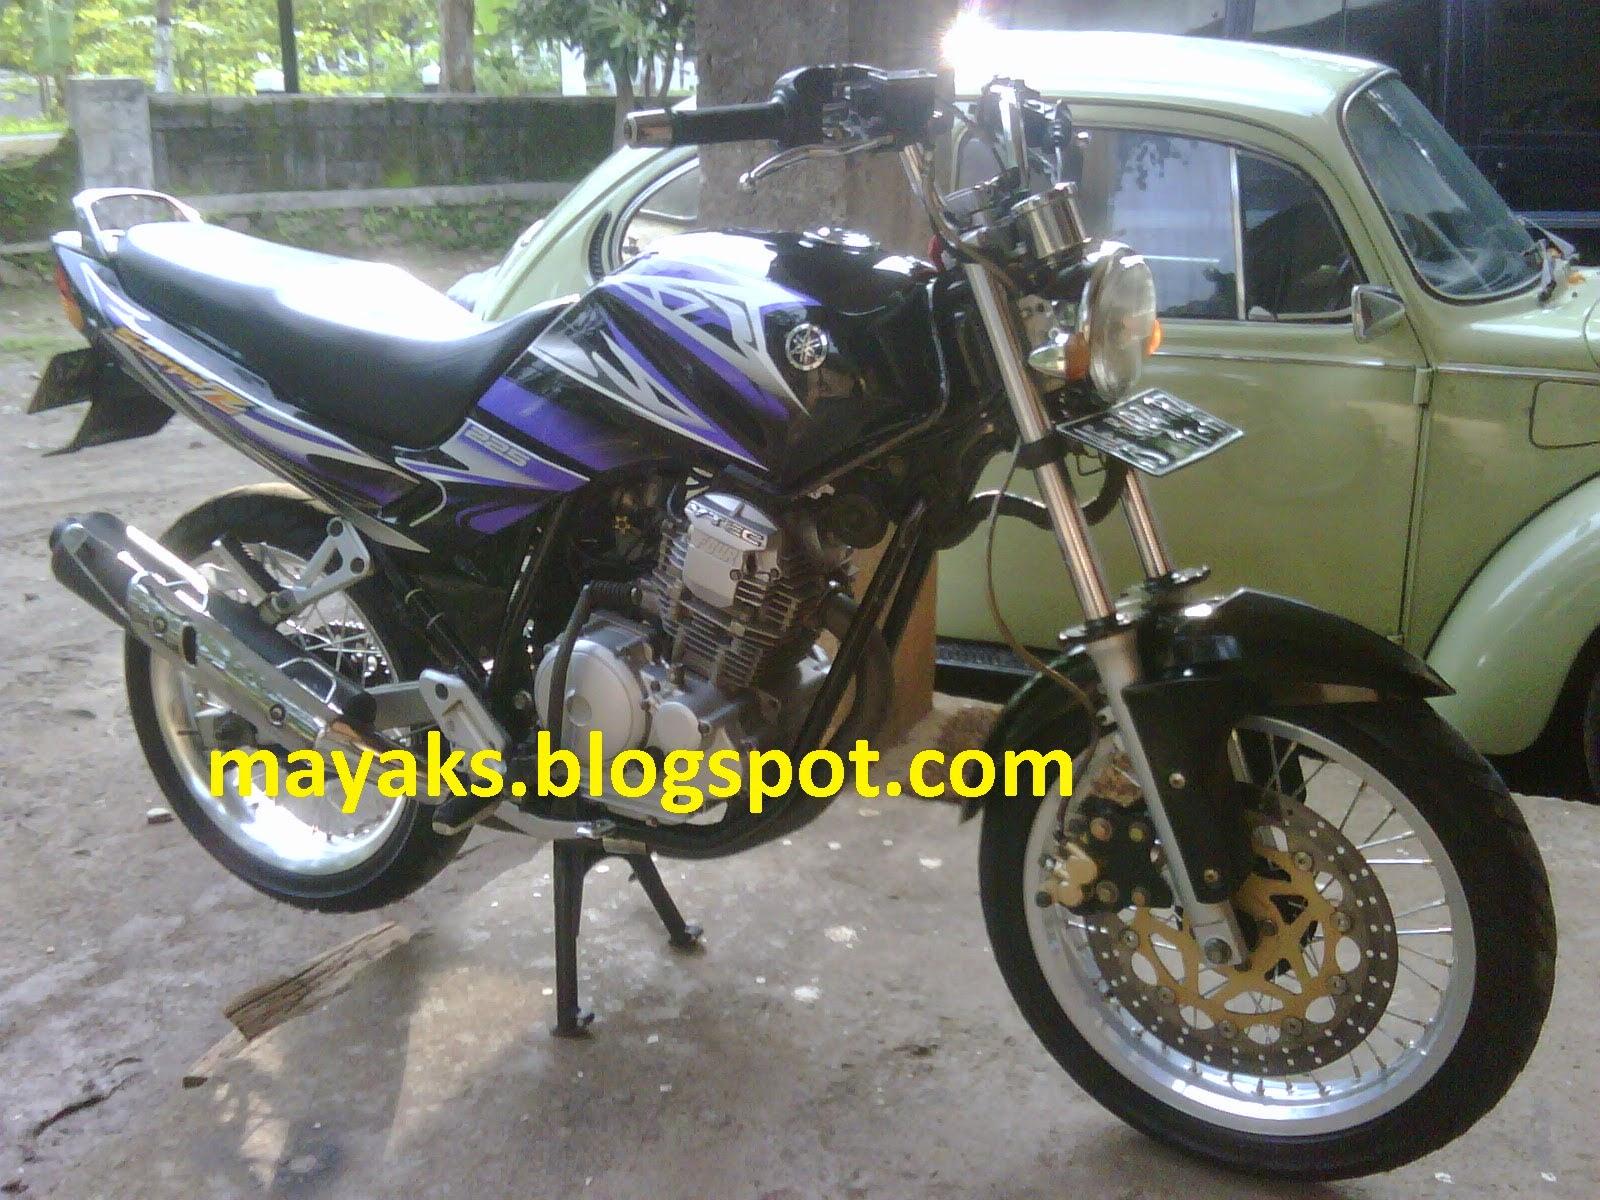 Modif Yamaha New Scorpio Z 2013